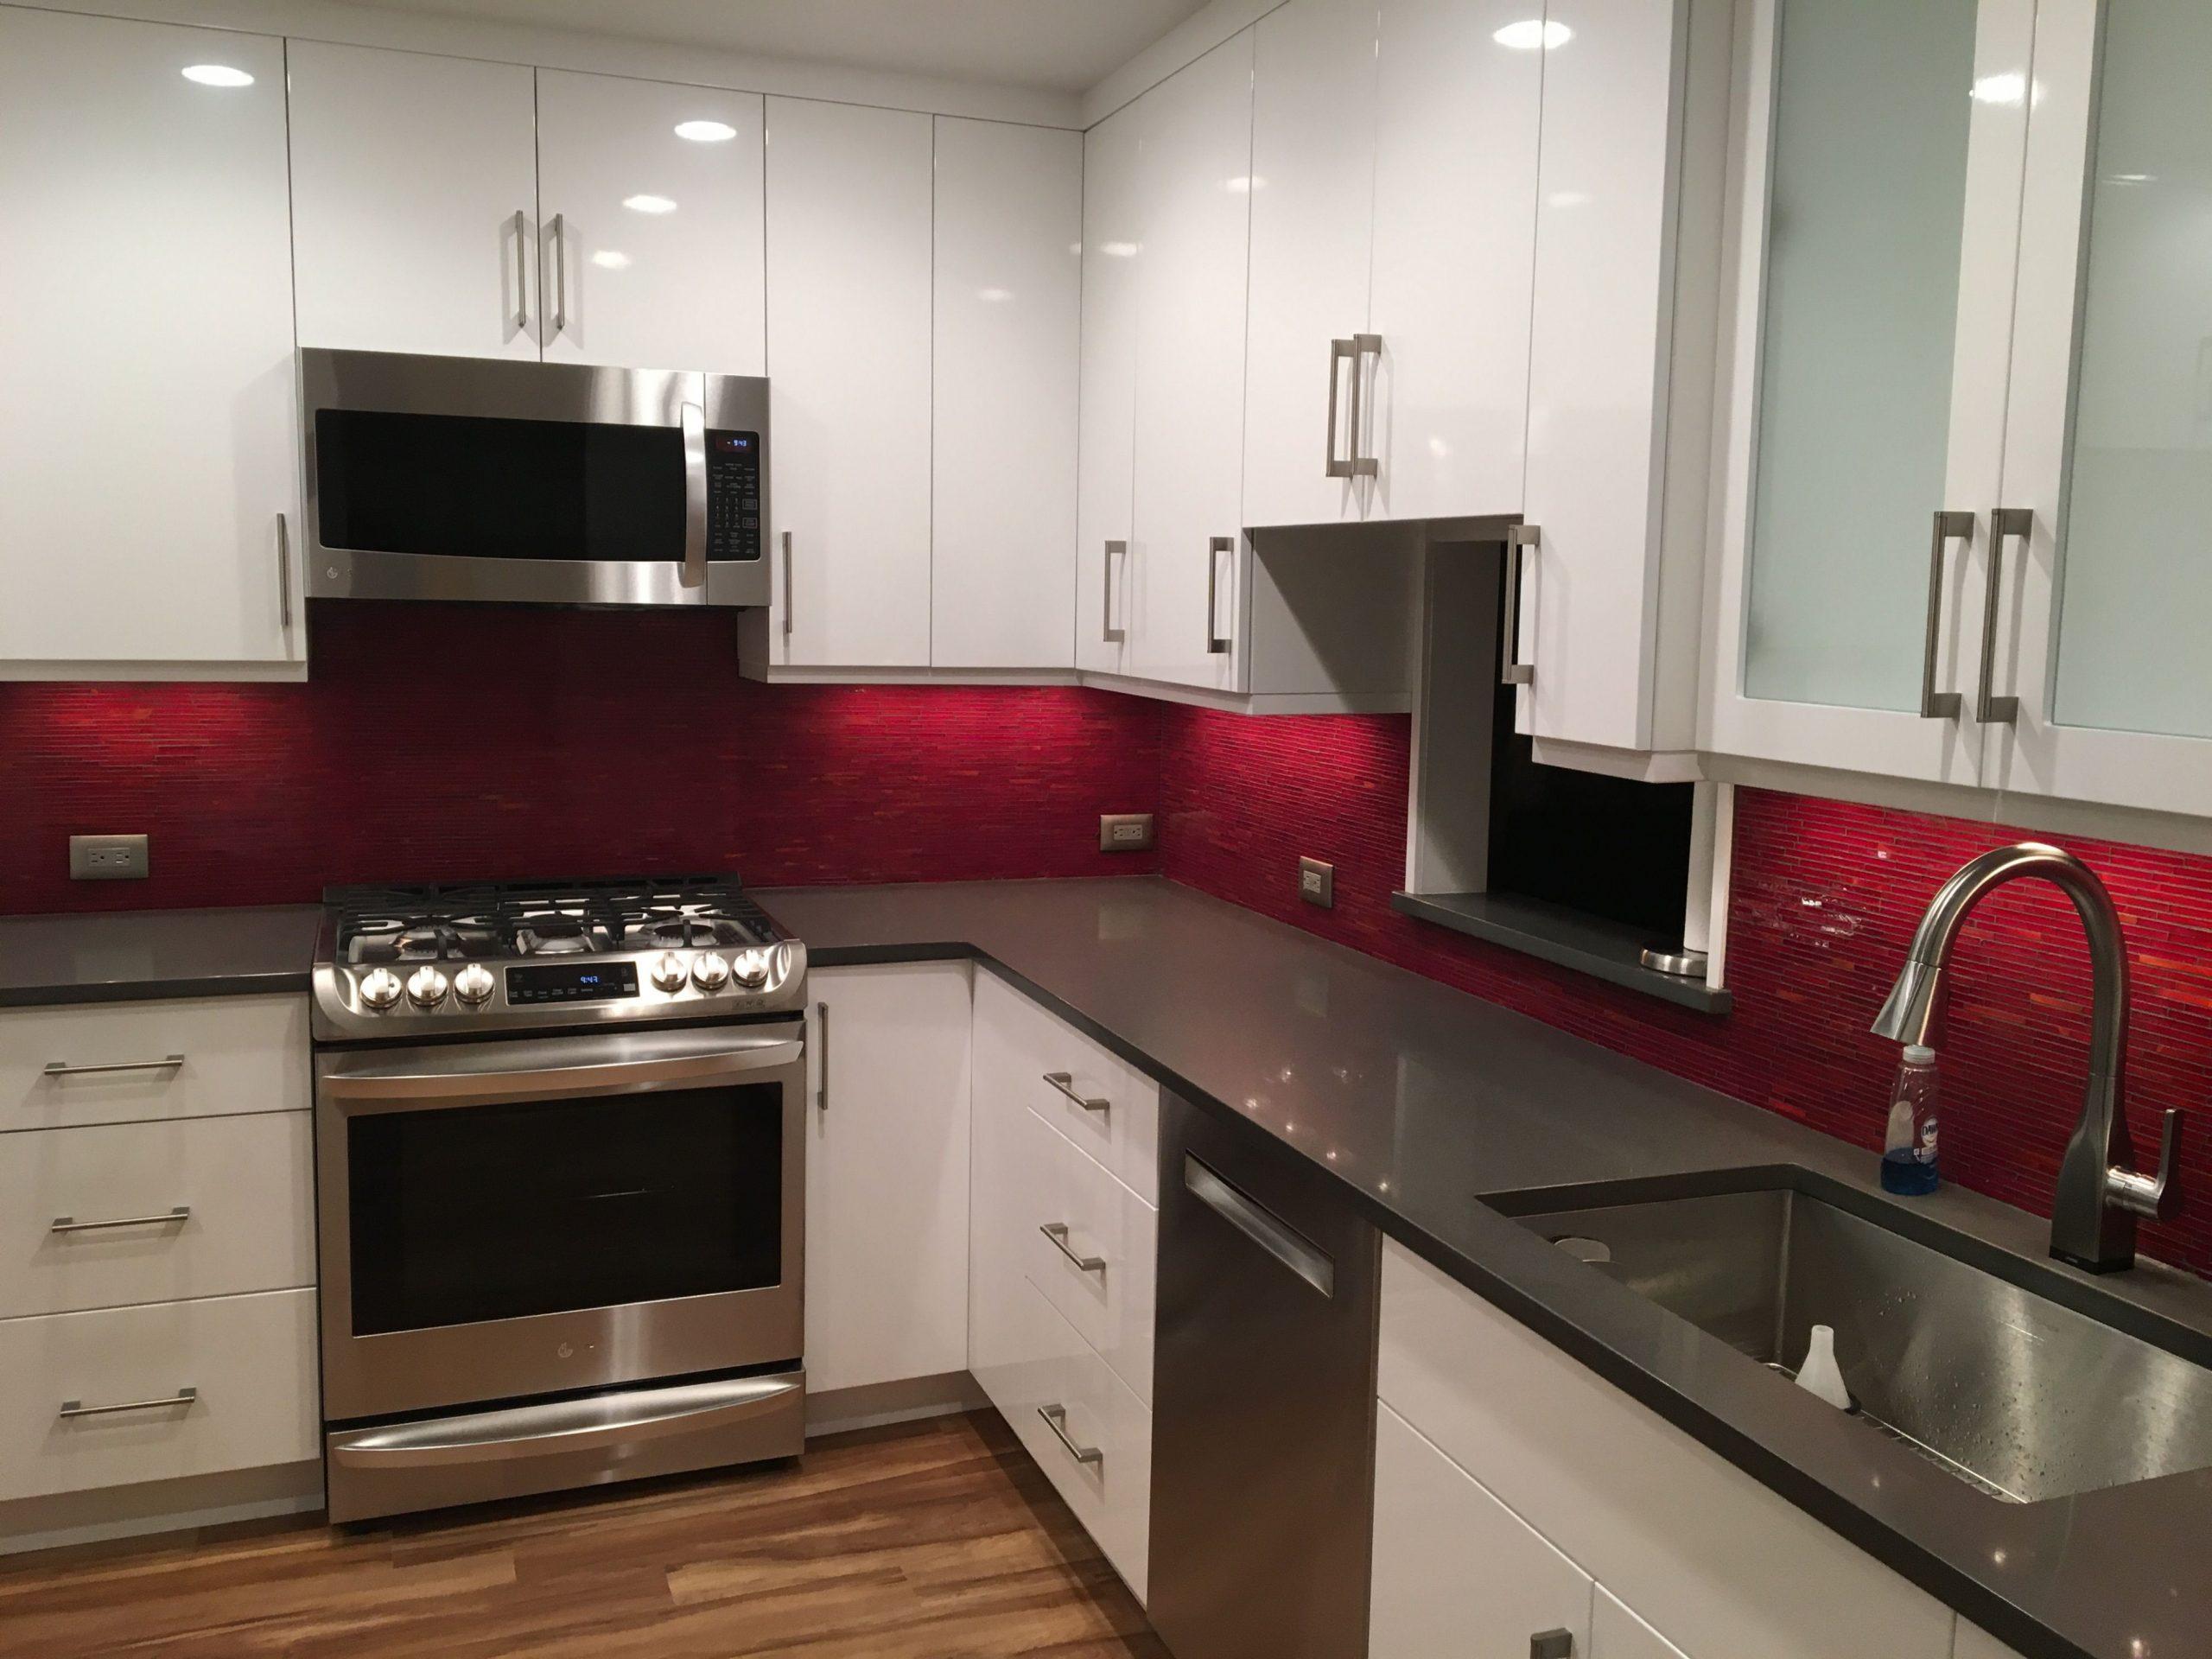 Modern, white kitchen cabinets with red glass backsplash